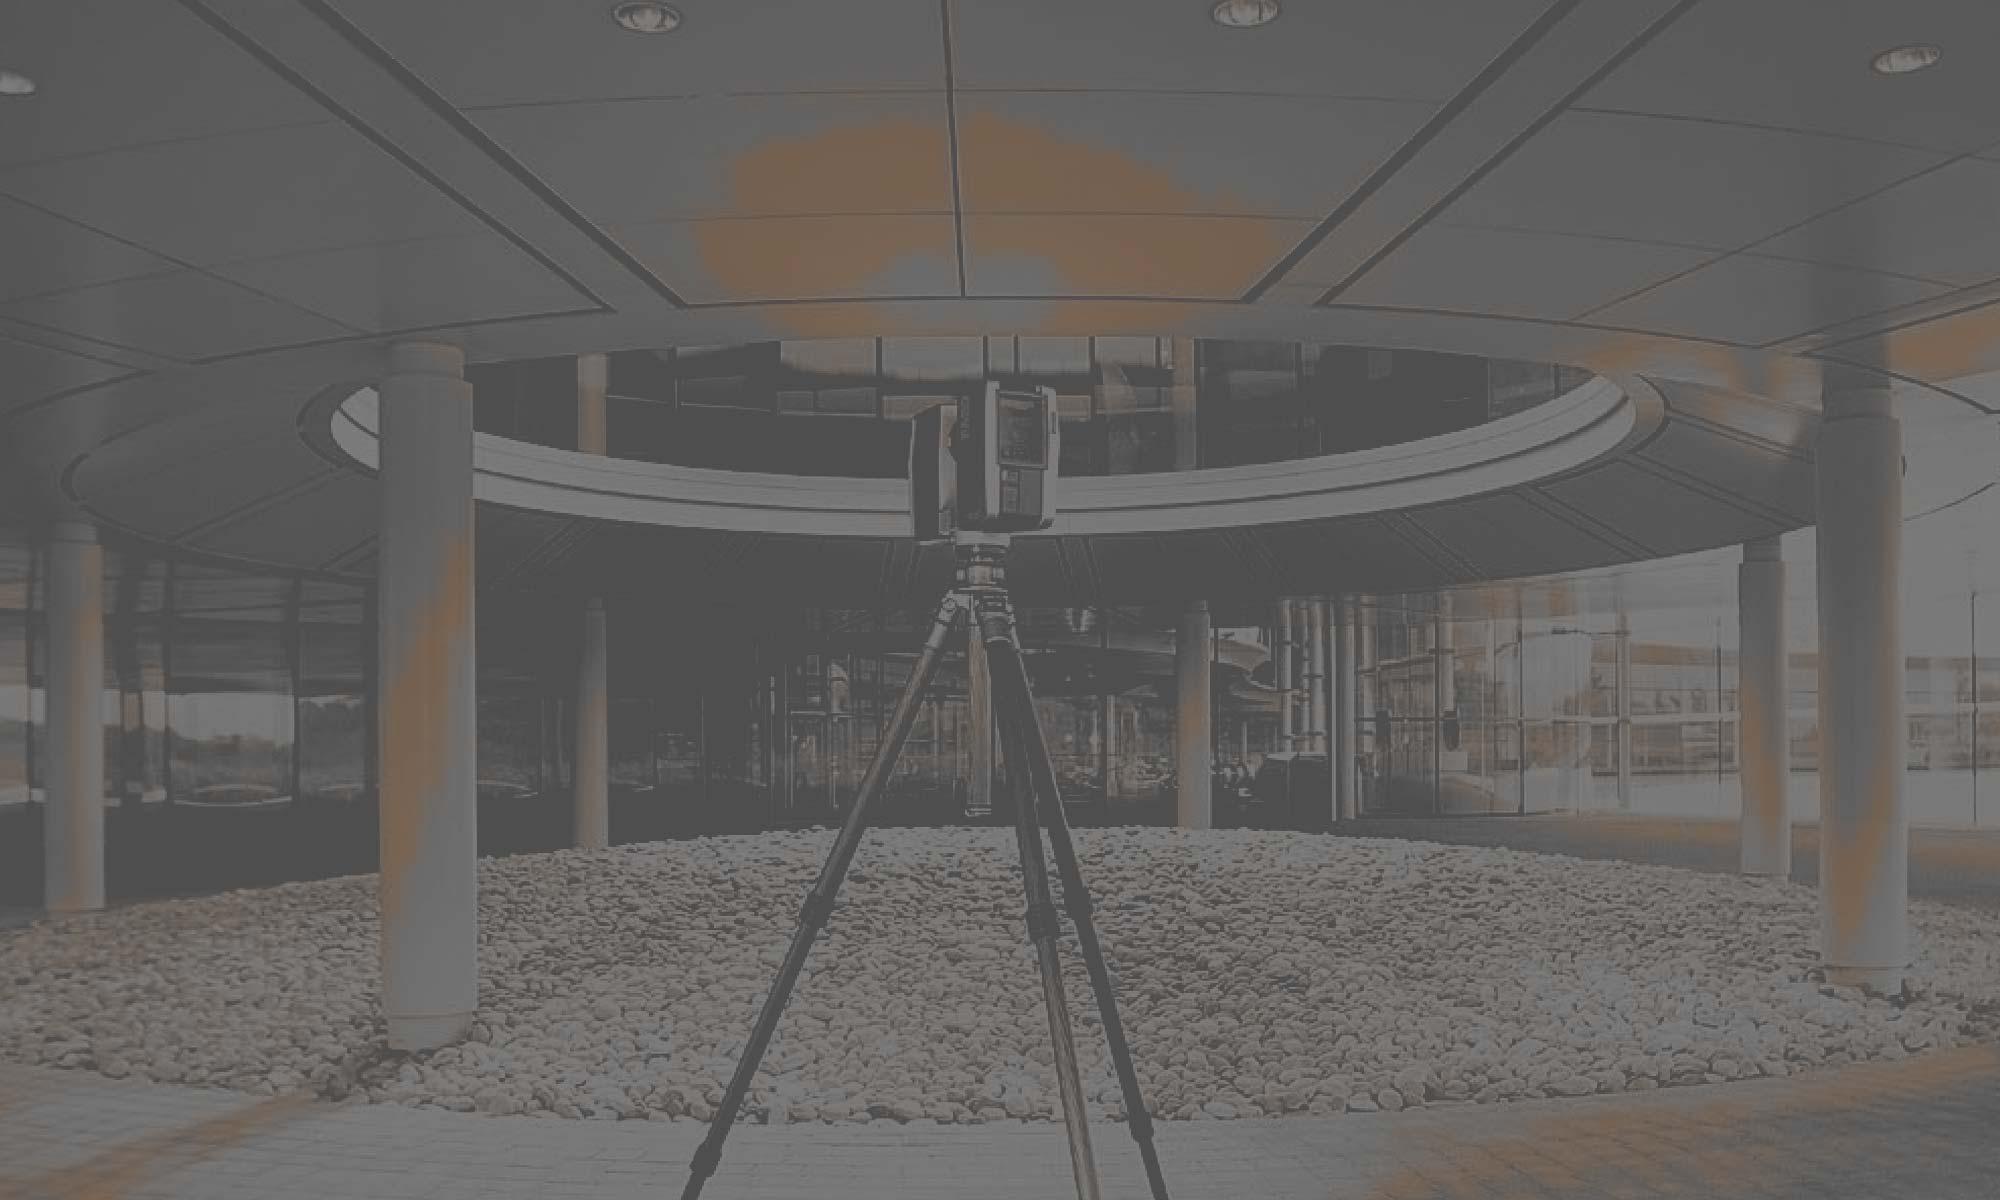 3D-Laser Scanner FARO